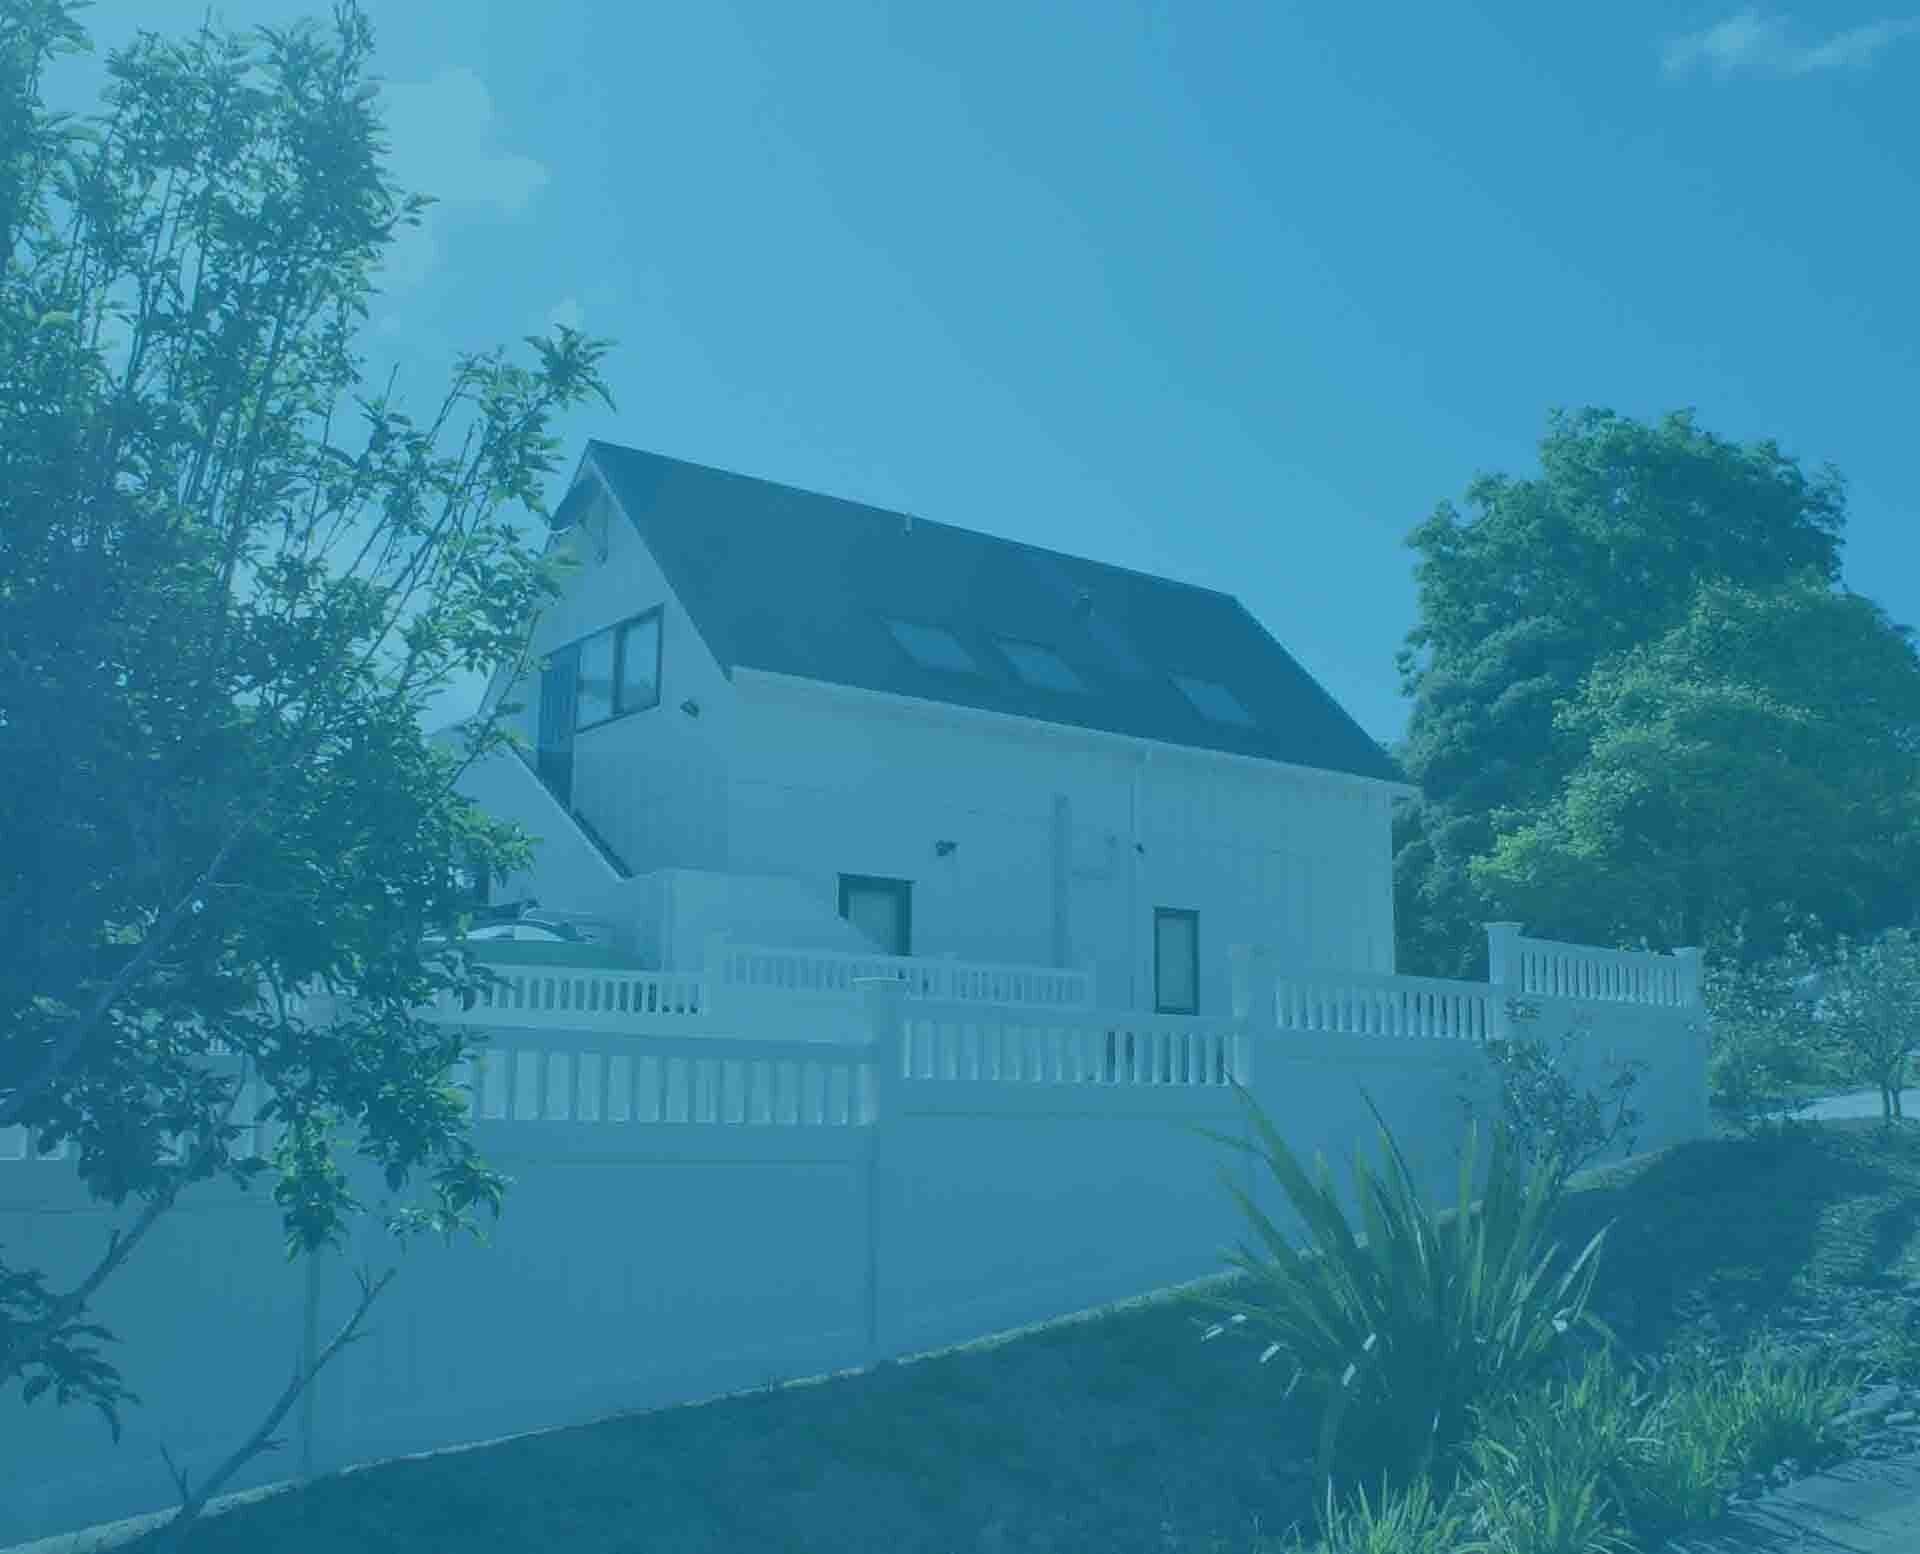 Loft Homes And Garages